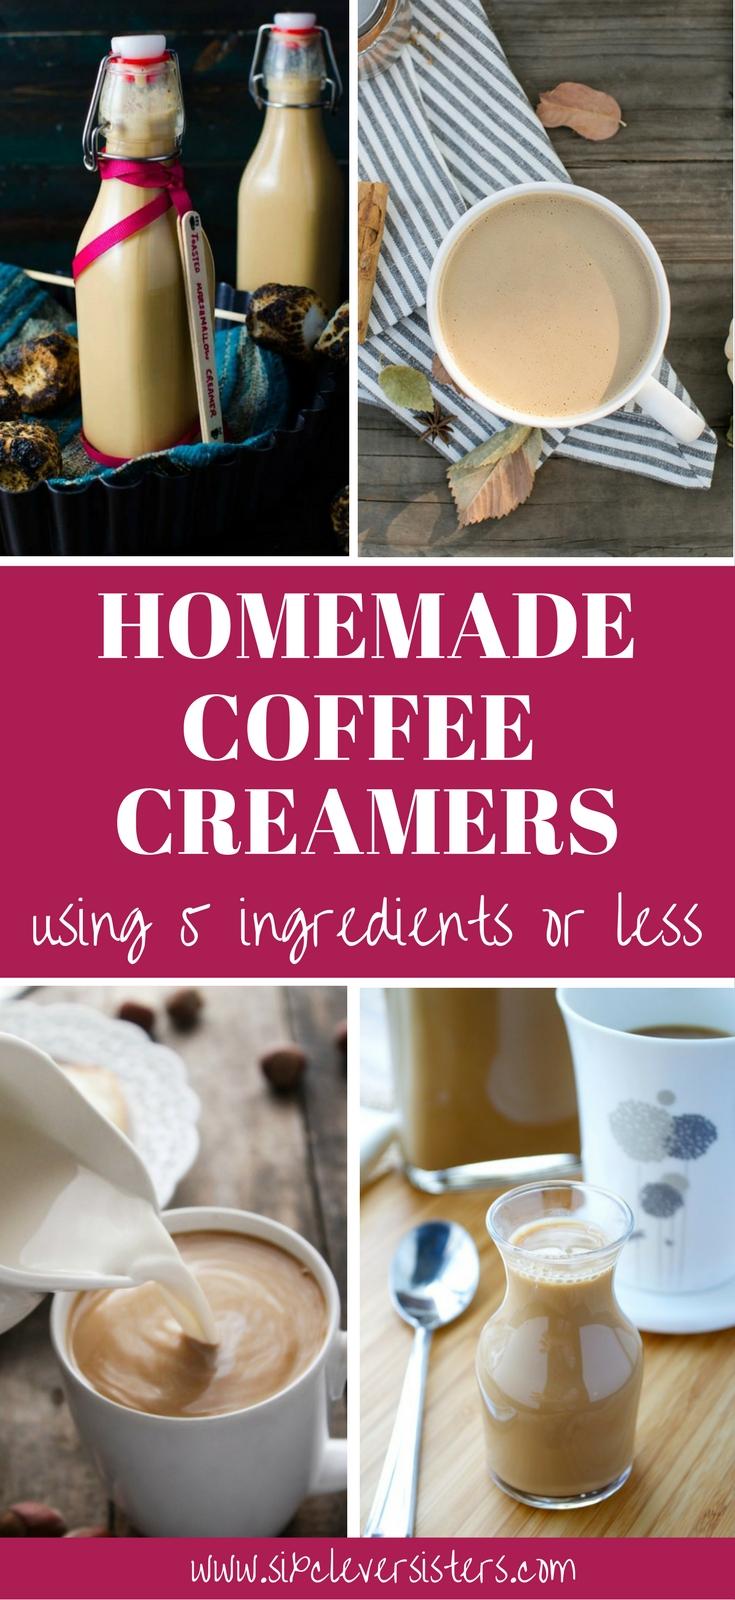 Coffee Creamer Homemade | Coffee Creamer Recipe | Homemade Coffee Creamer |  Homemade Coffee Drinks |